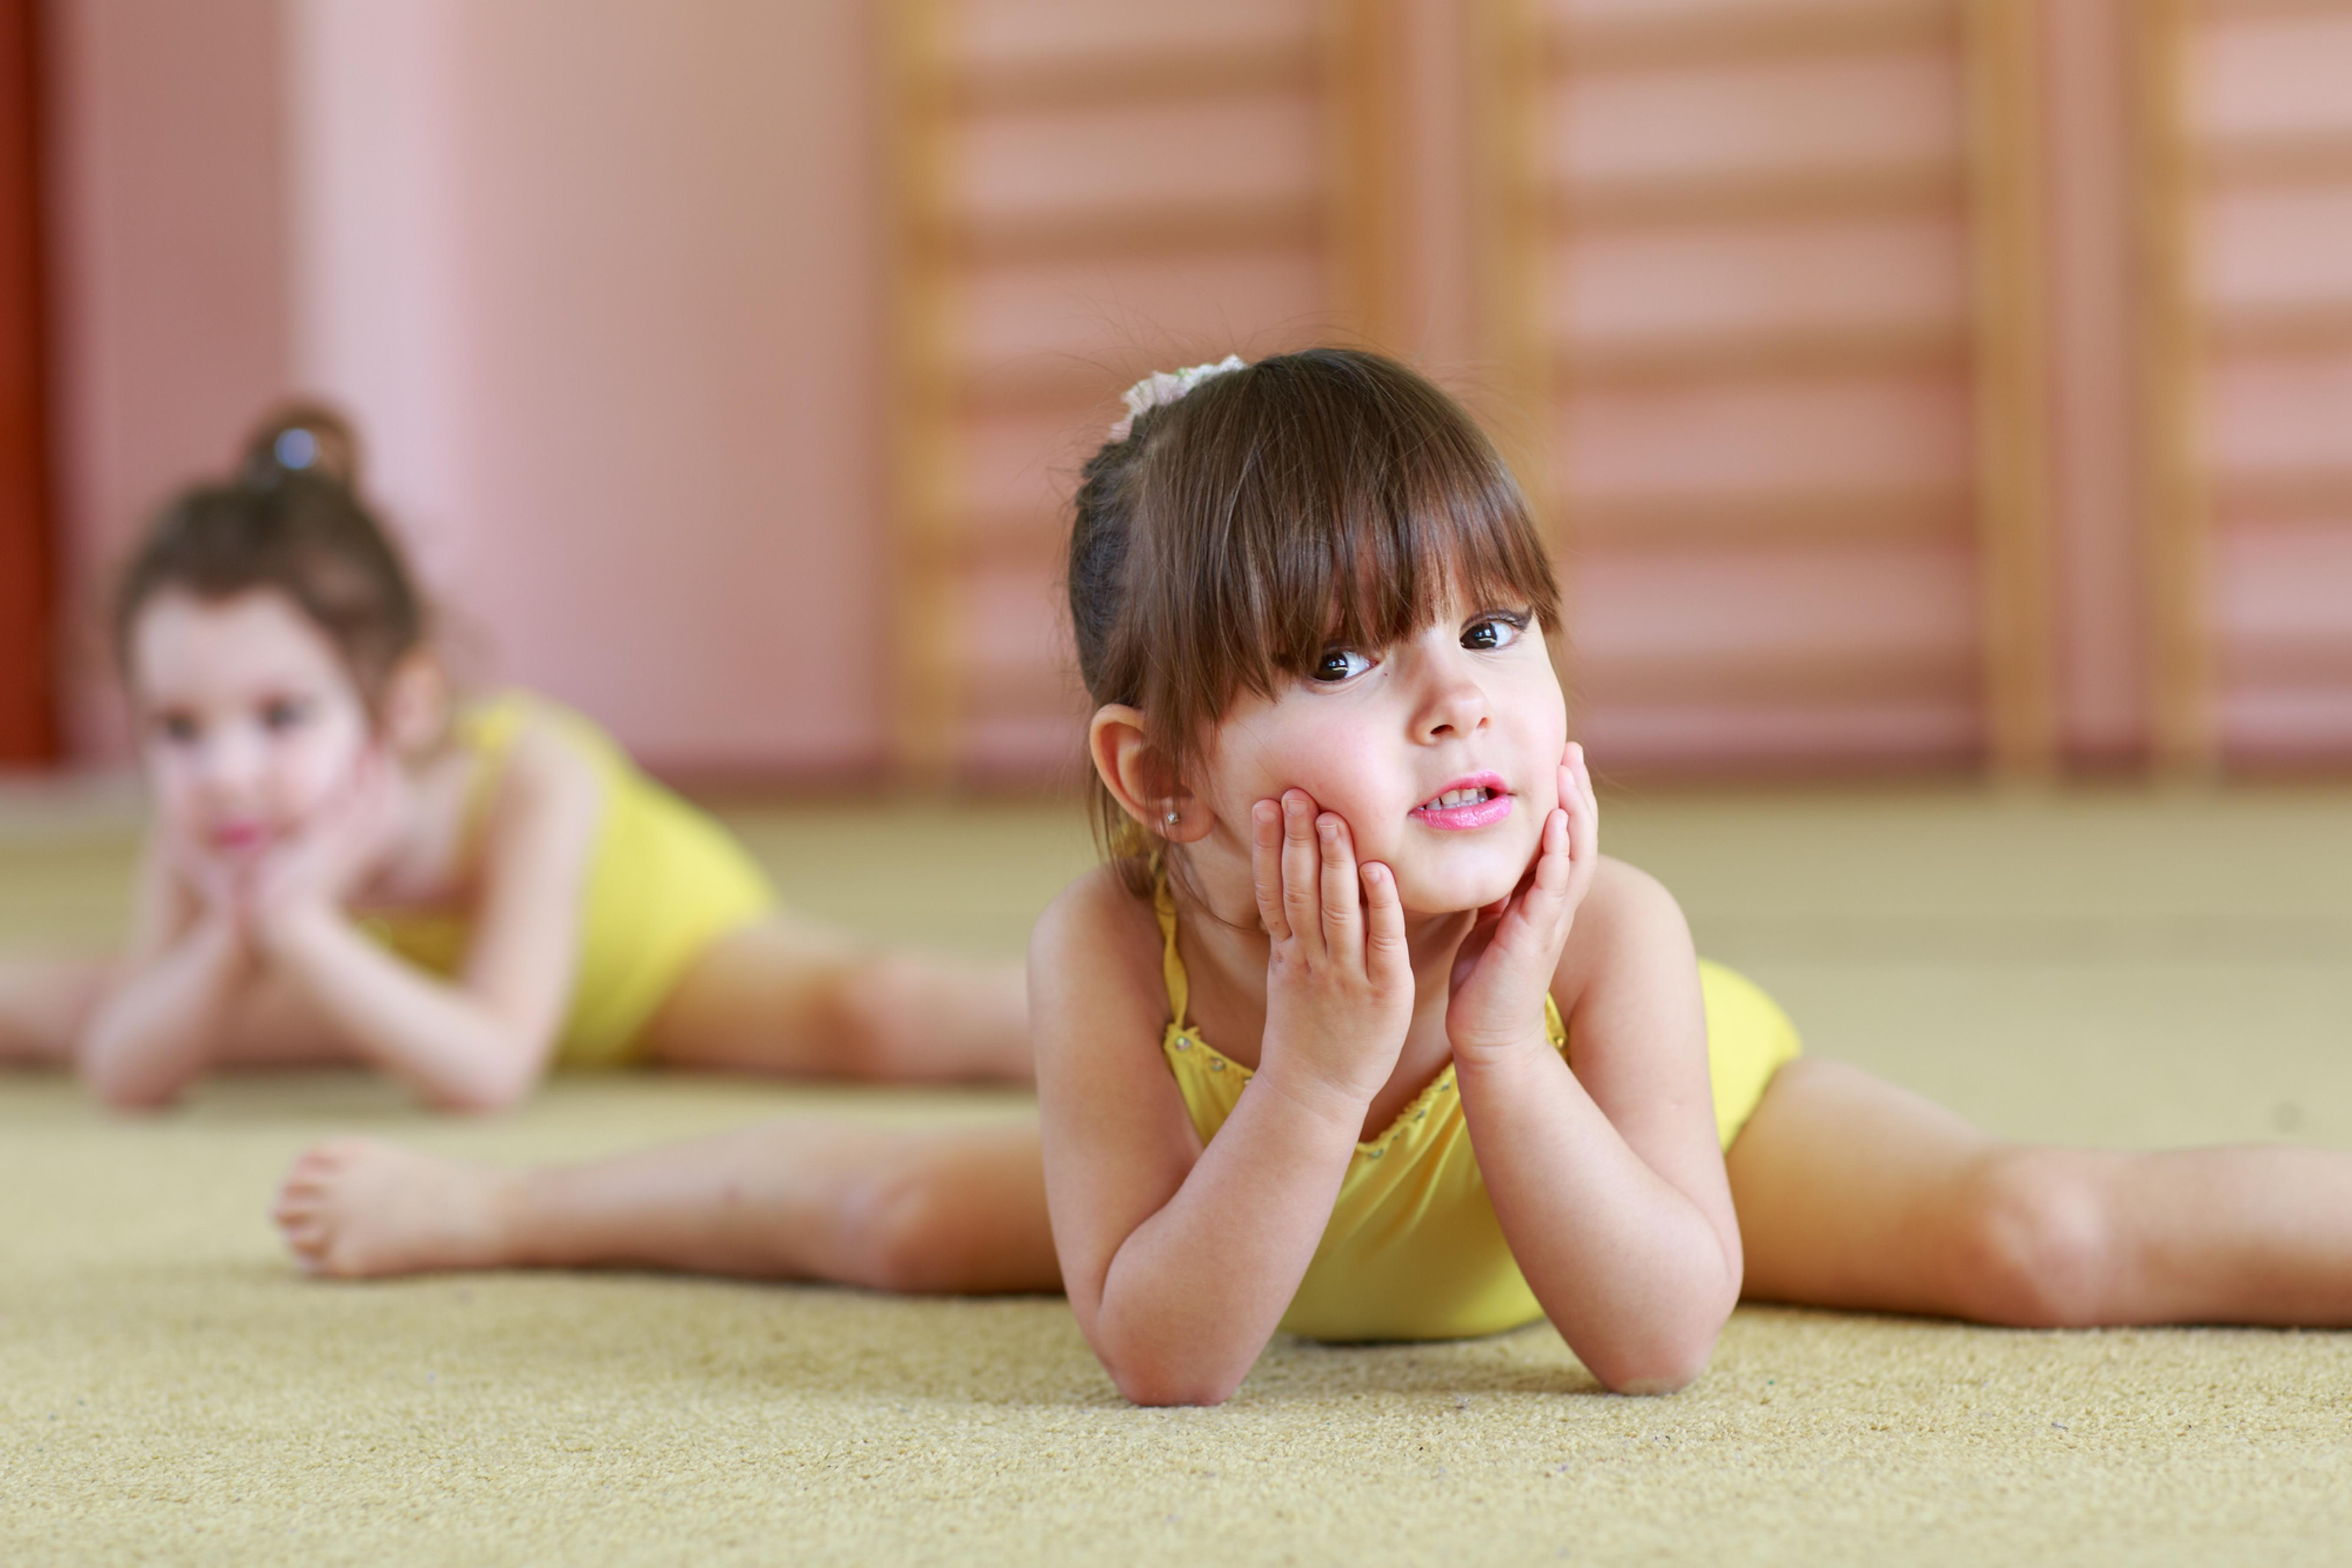 Kids gymnastics 4 years old